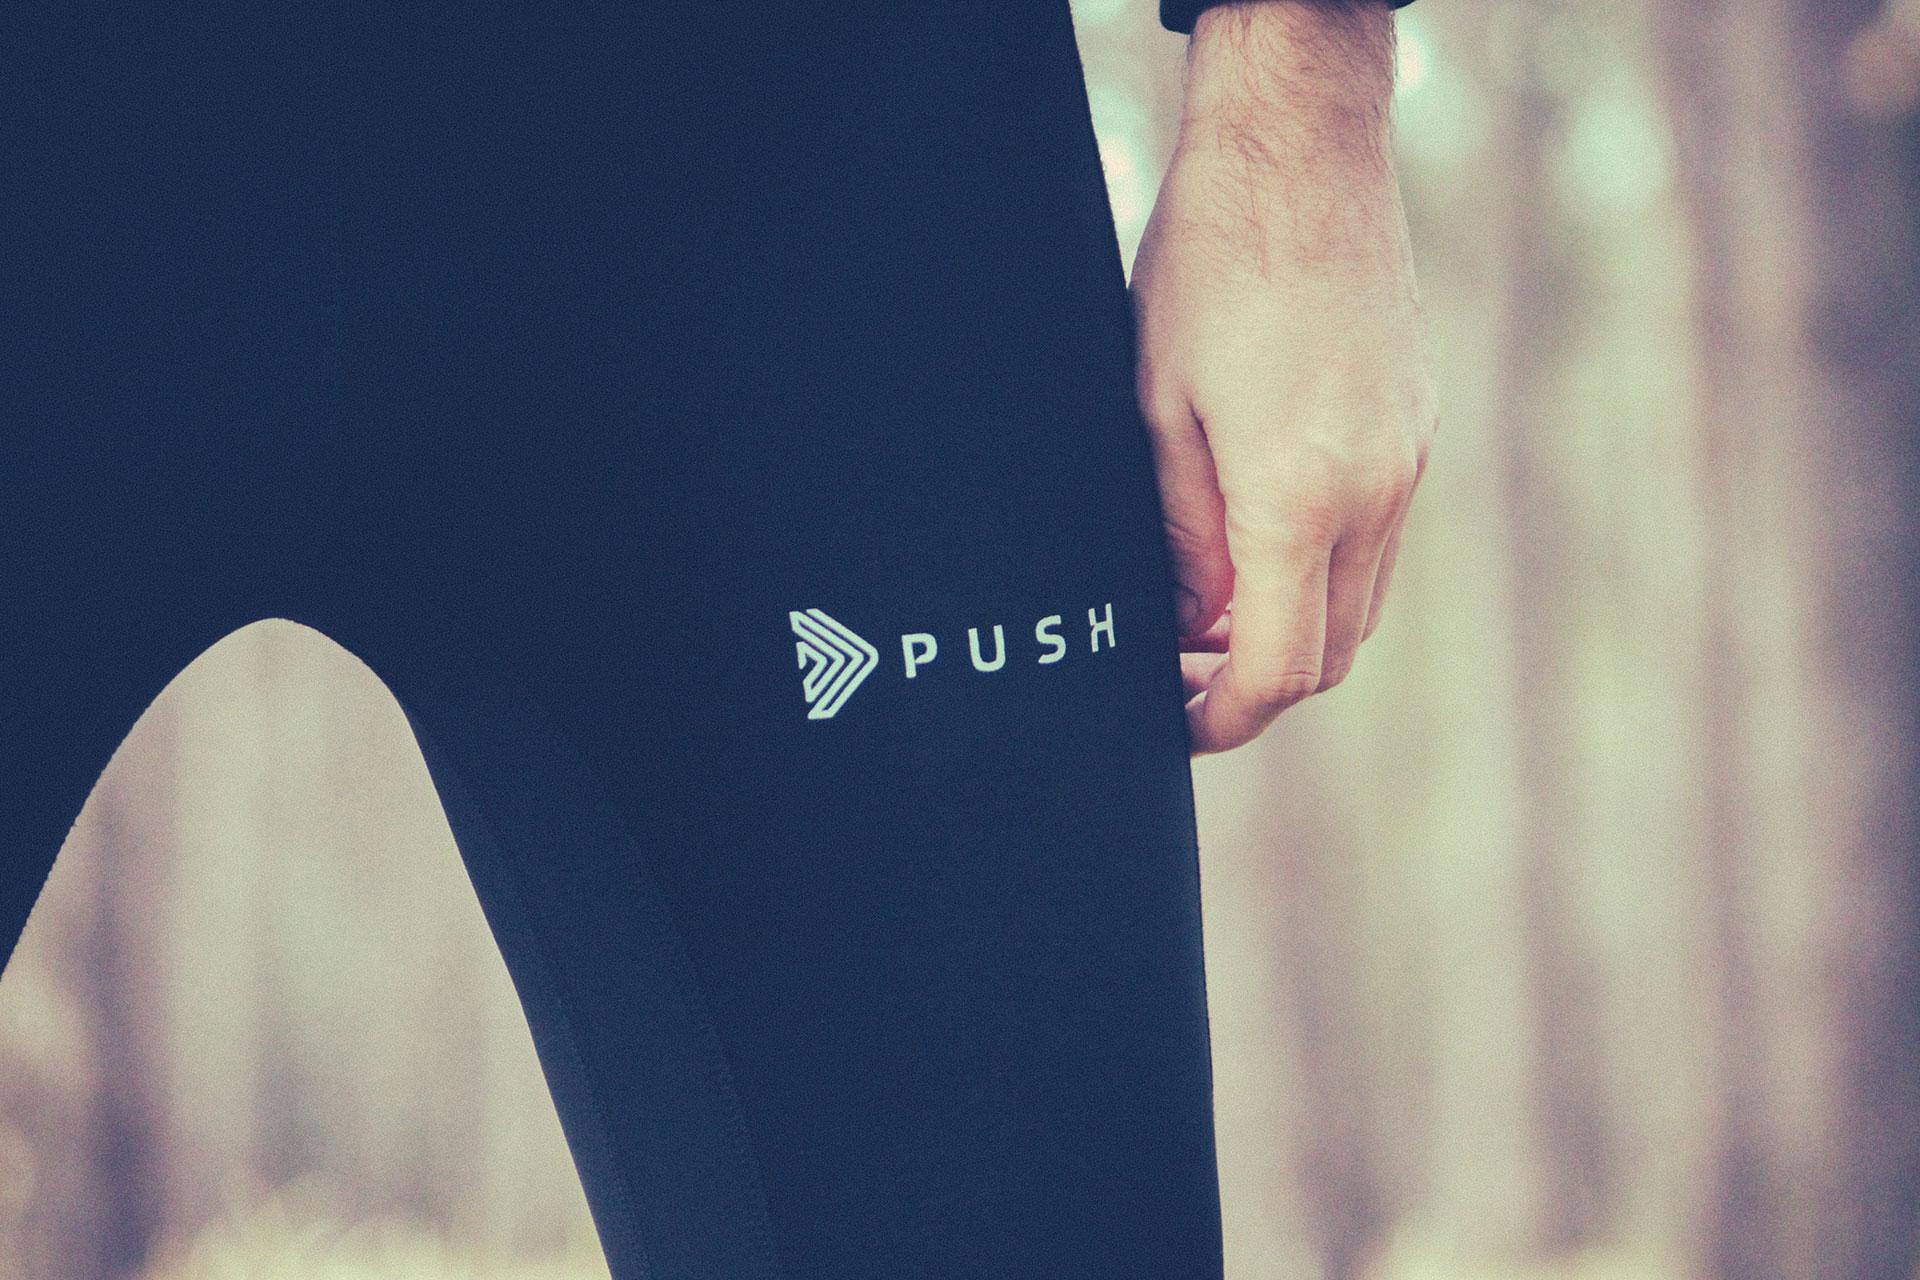 push-campaign-14